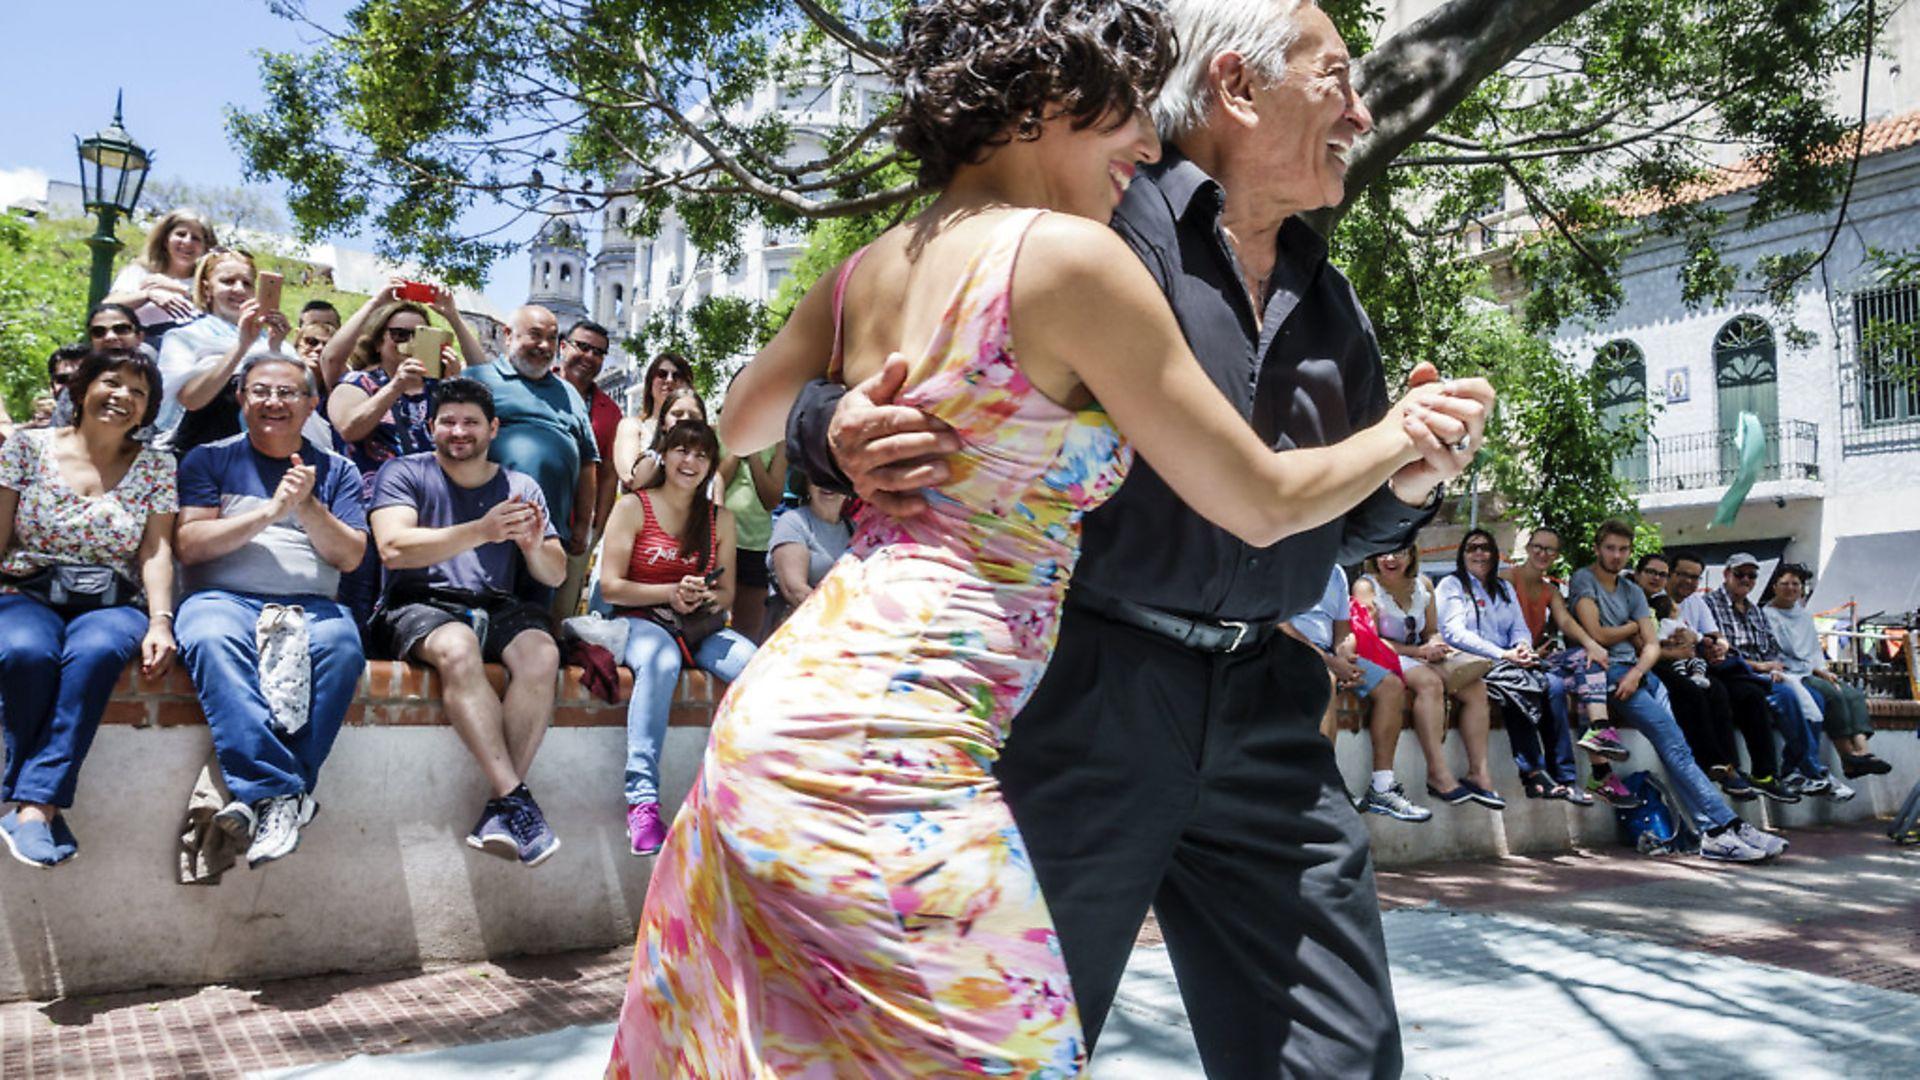 Tango dancers performing at San Telmo Plaza Dorrego. Photo: Jeffrey Greenberg/Universal Images Group via Getty Images - Credit: Universal Images Group via Getty